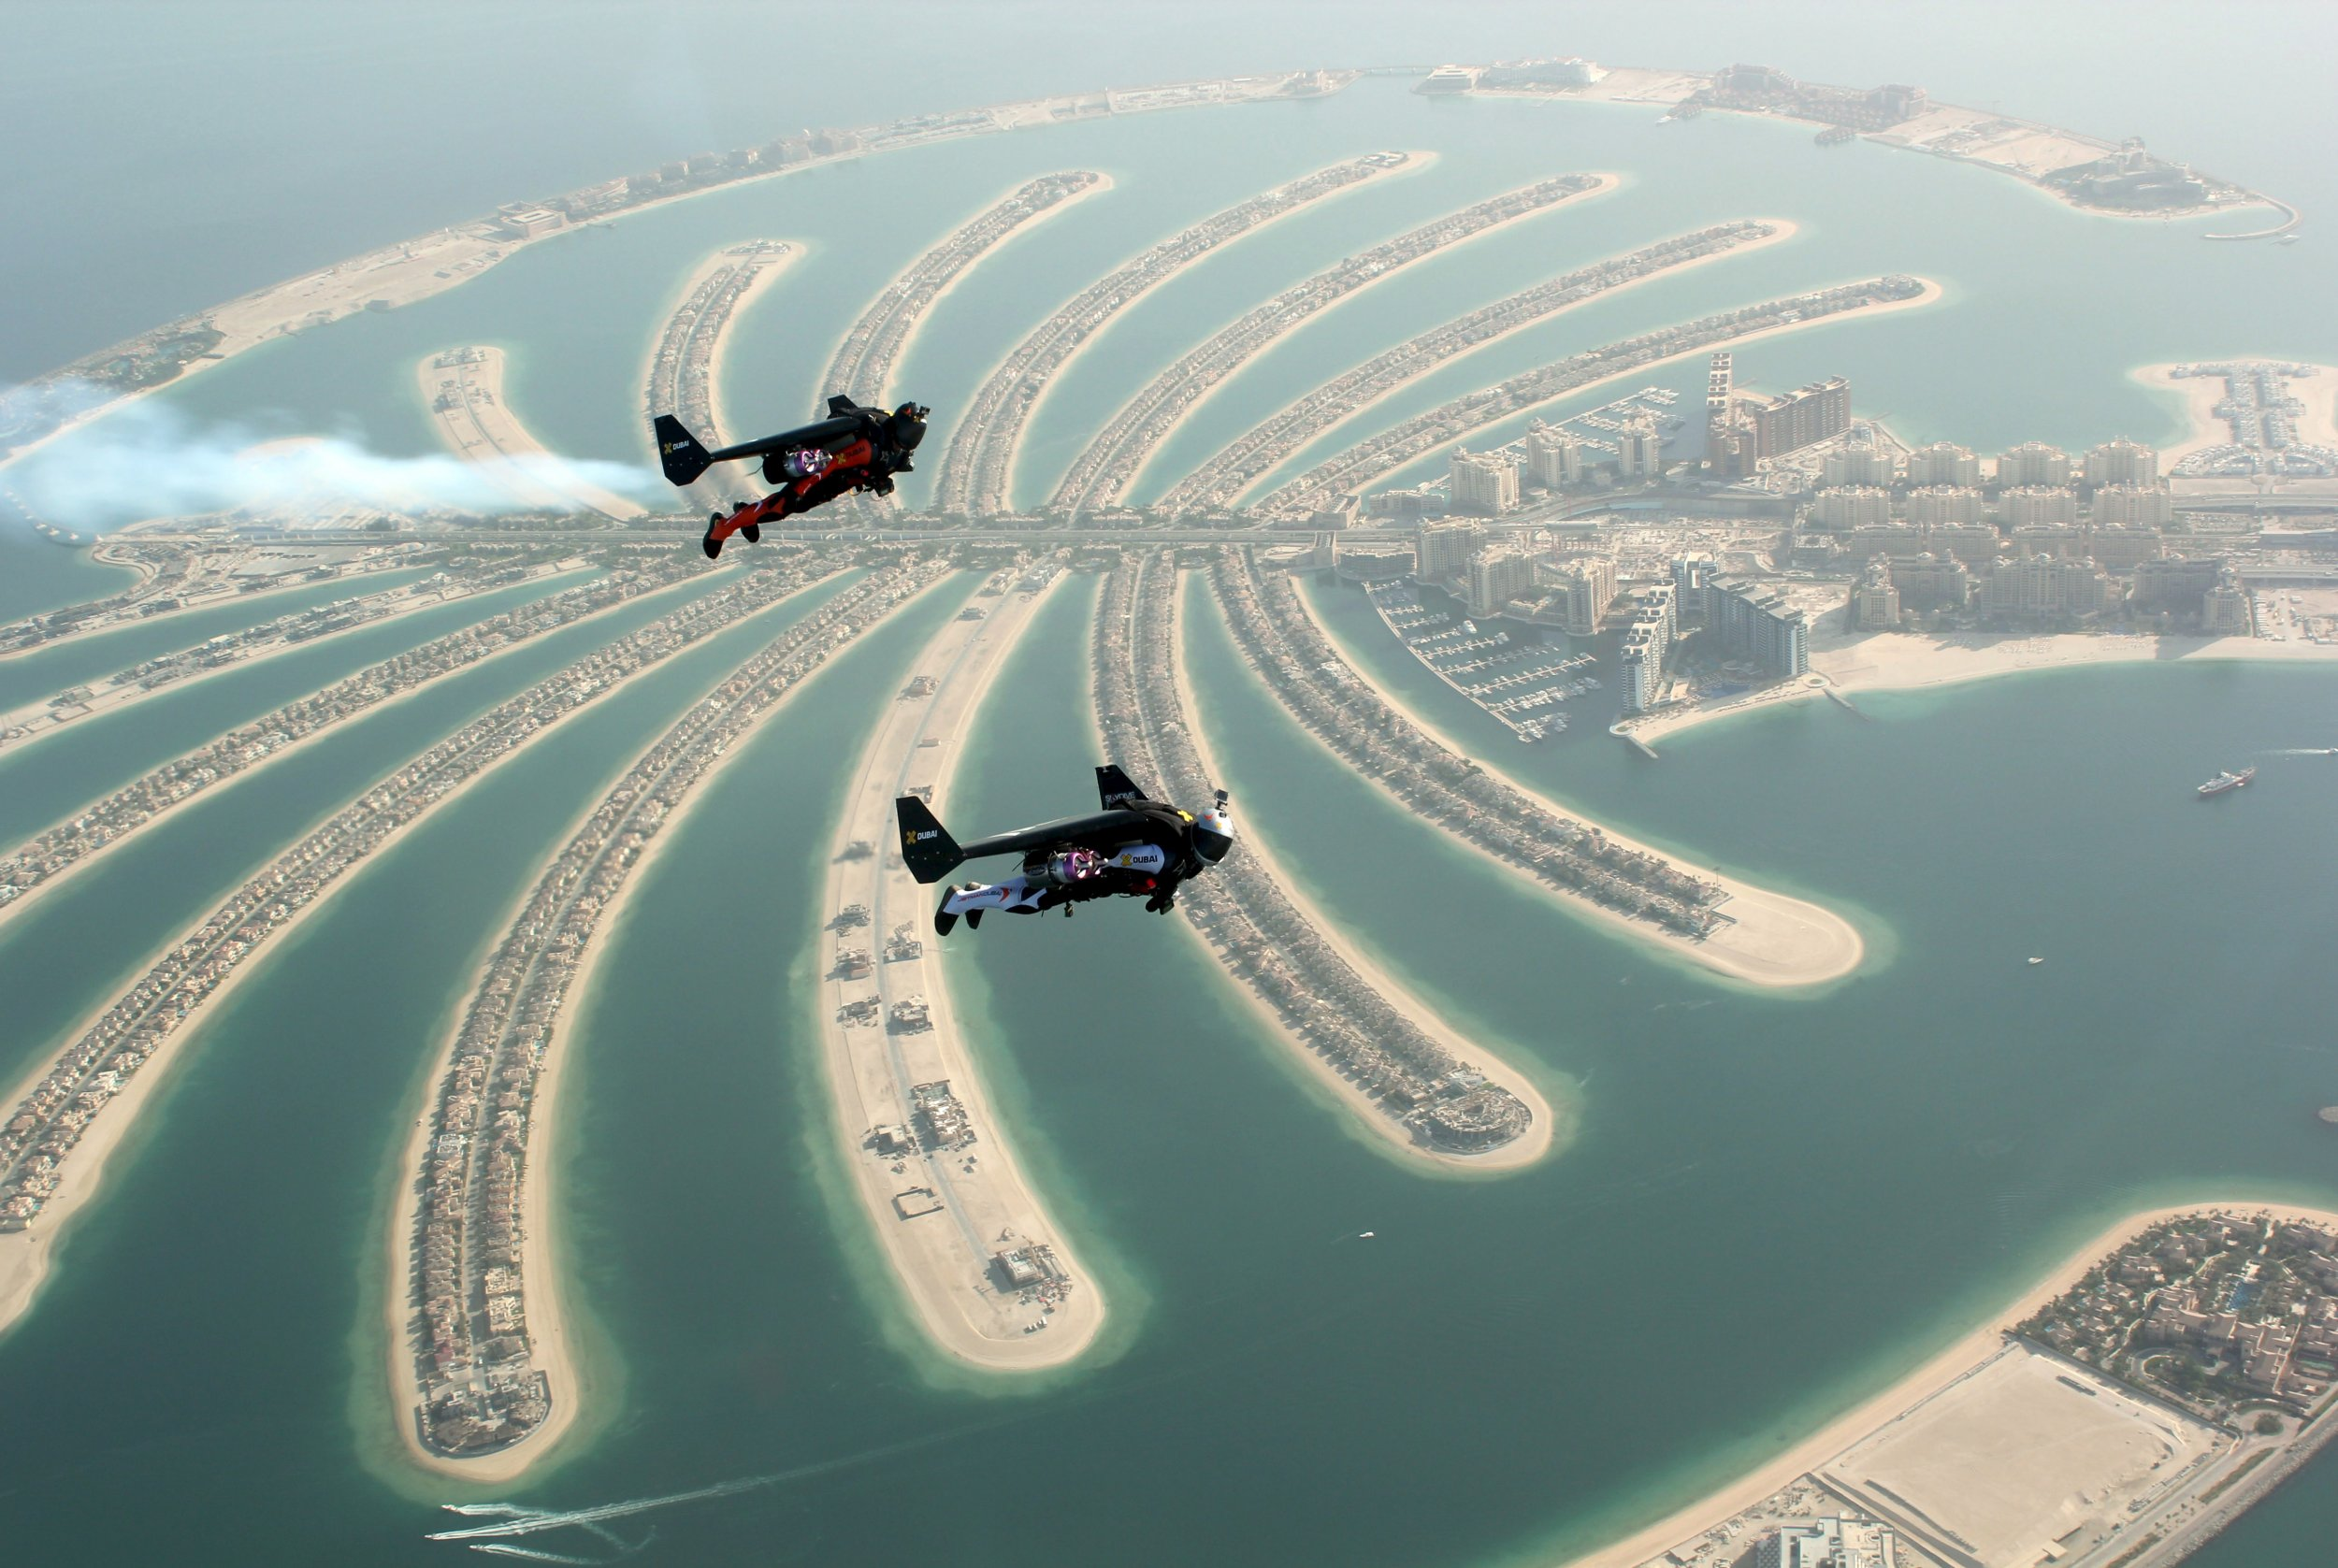 Watch Two Men Fly Over Dubai In Jetpacks